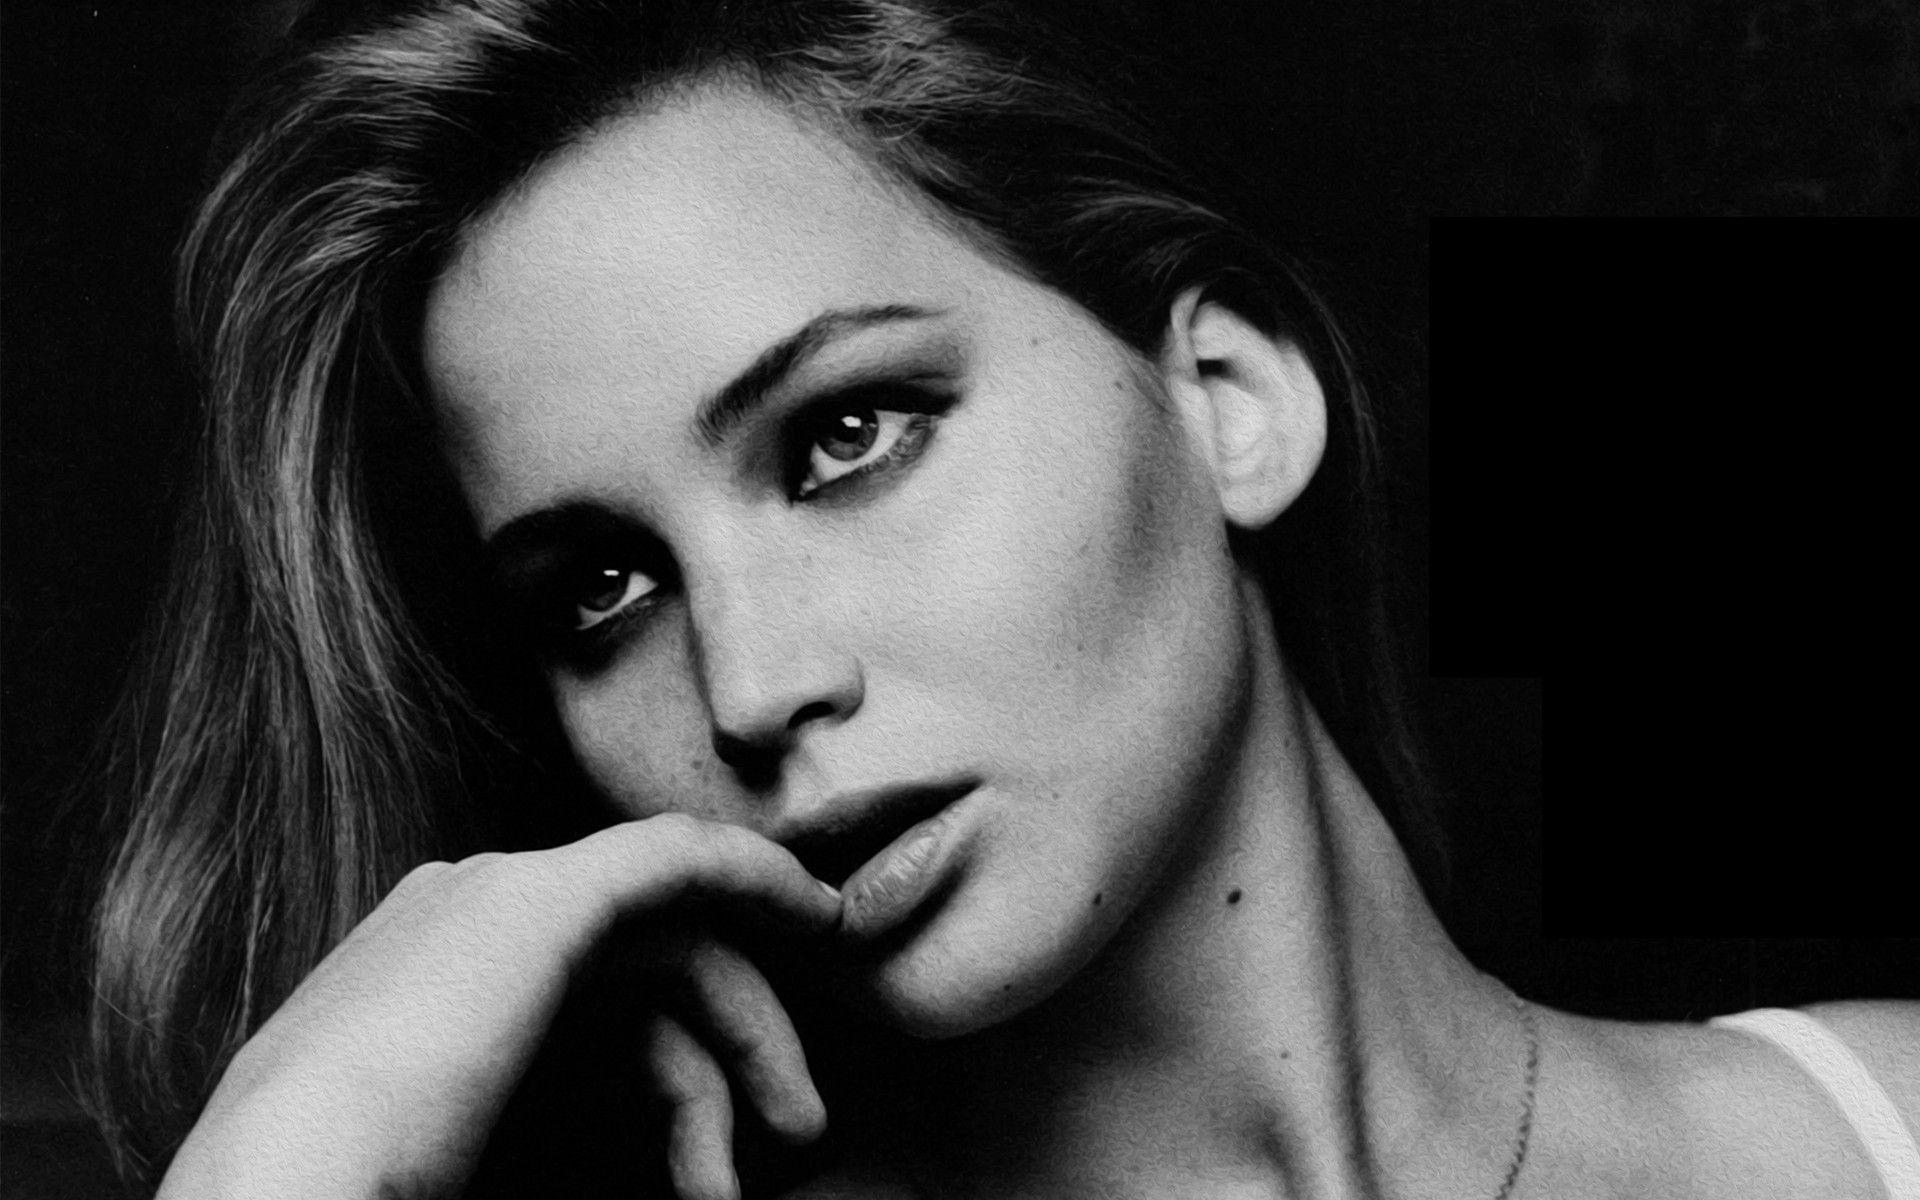 Jennifer Lawrence Sexy Hd Hd Desktop 9 HD Wallpapers | Hdwalljoy.